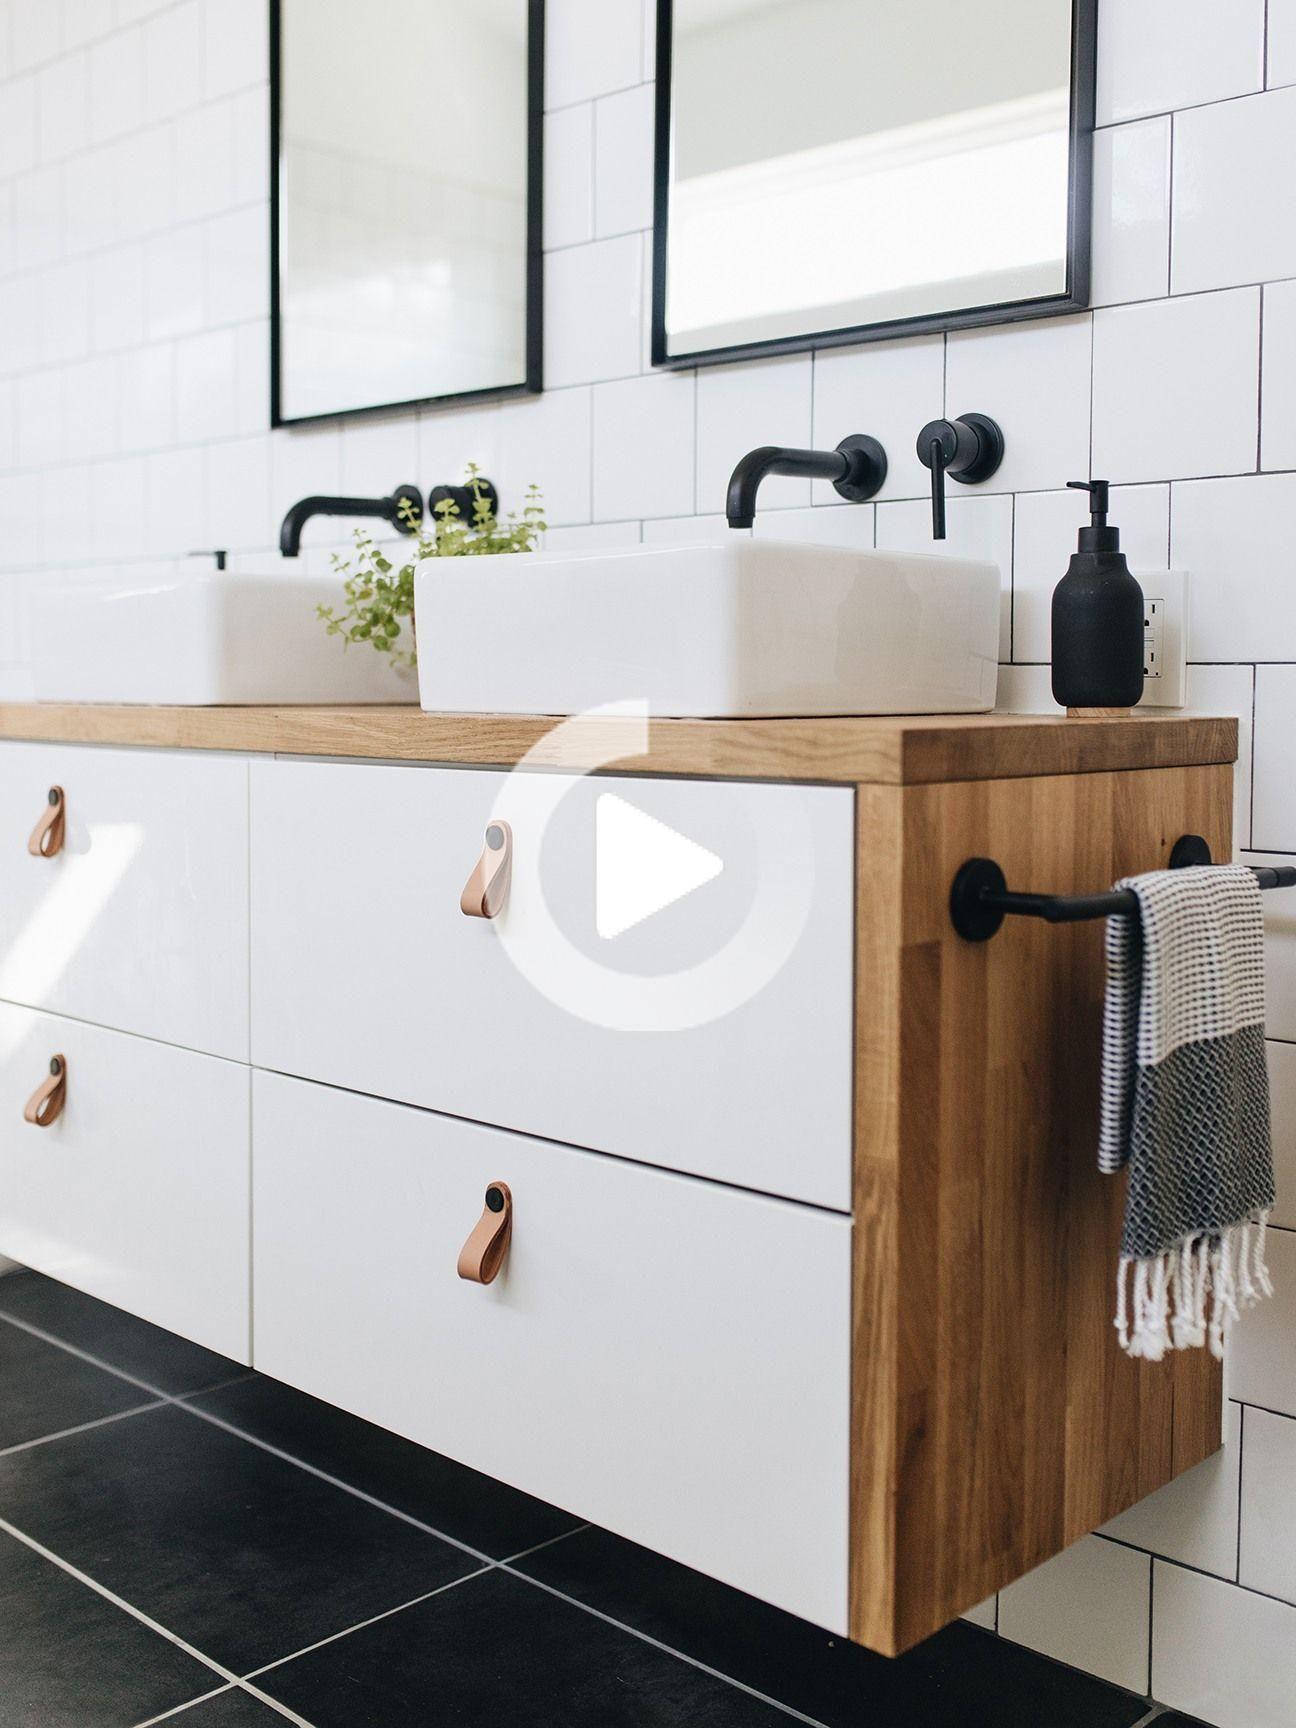 10 IKEA Hacks für kleine Badezimmer in 2020   Ikea badezimmer, Ikea, Ikea hacks